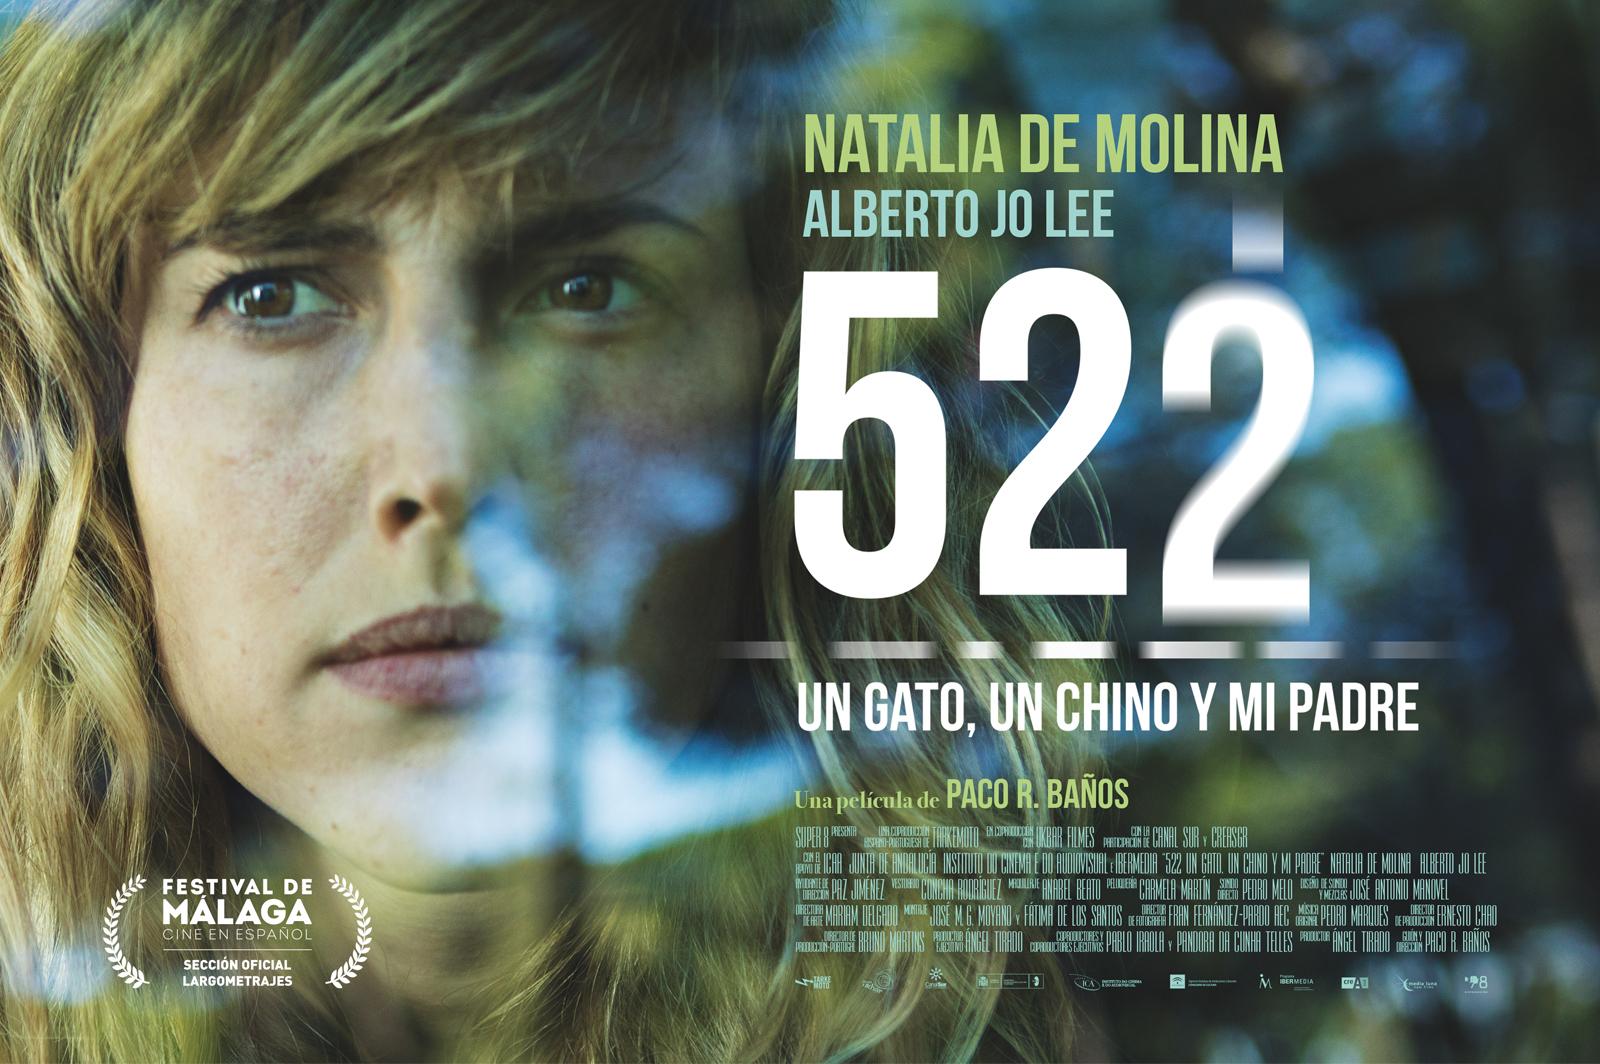 Pedro Cabañas - Design - 522. UN GATO, UN CHINO Y MI PADRE